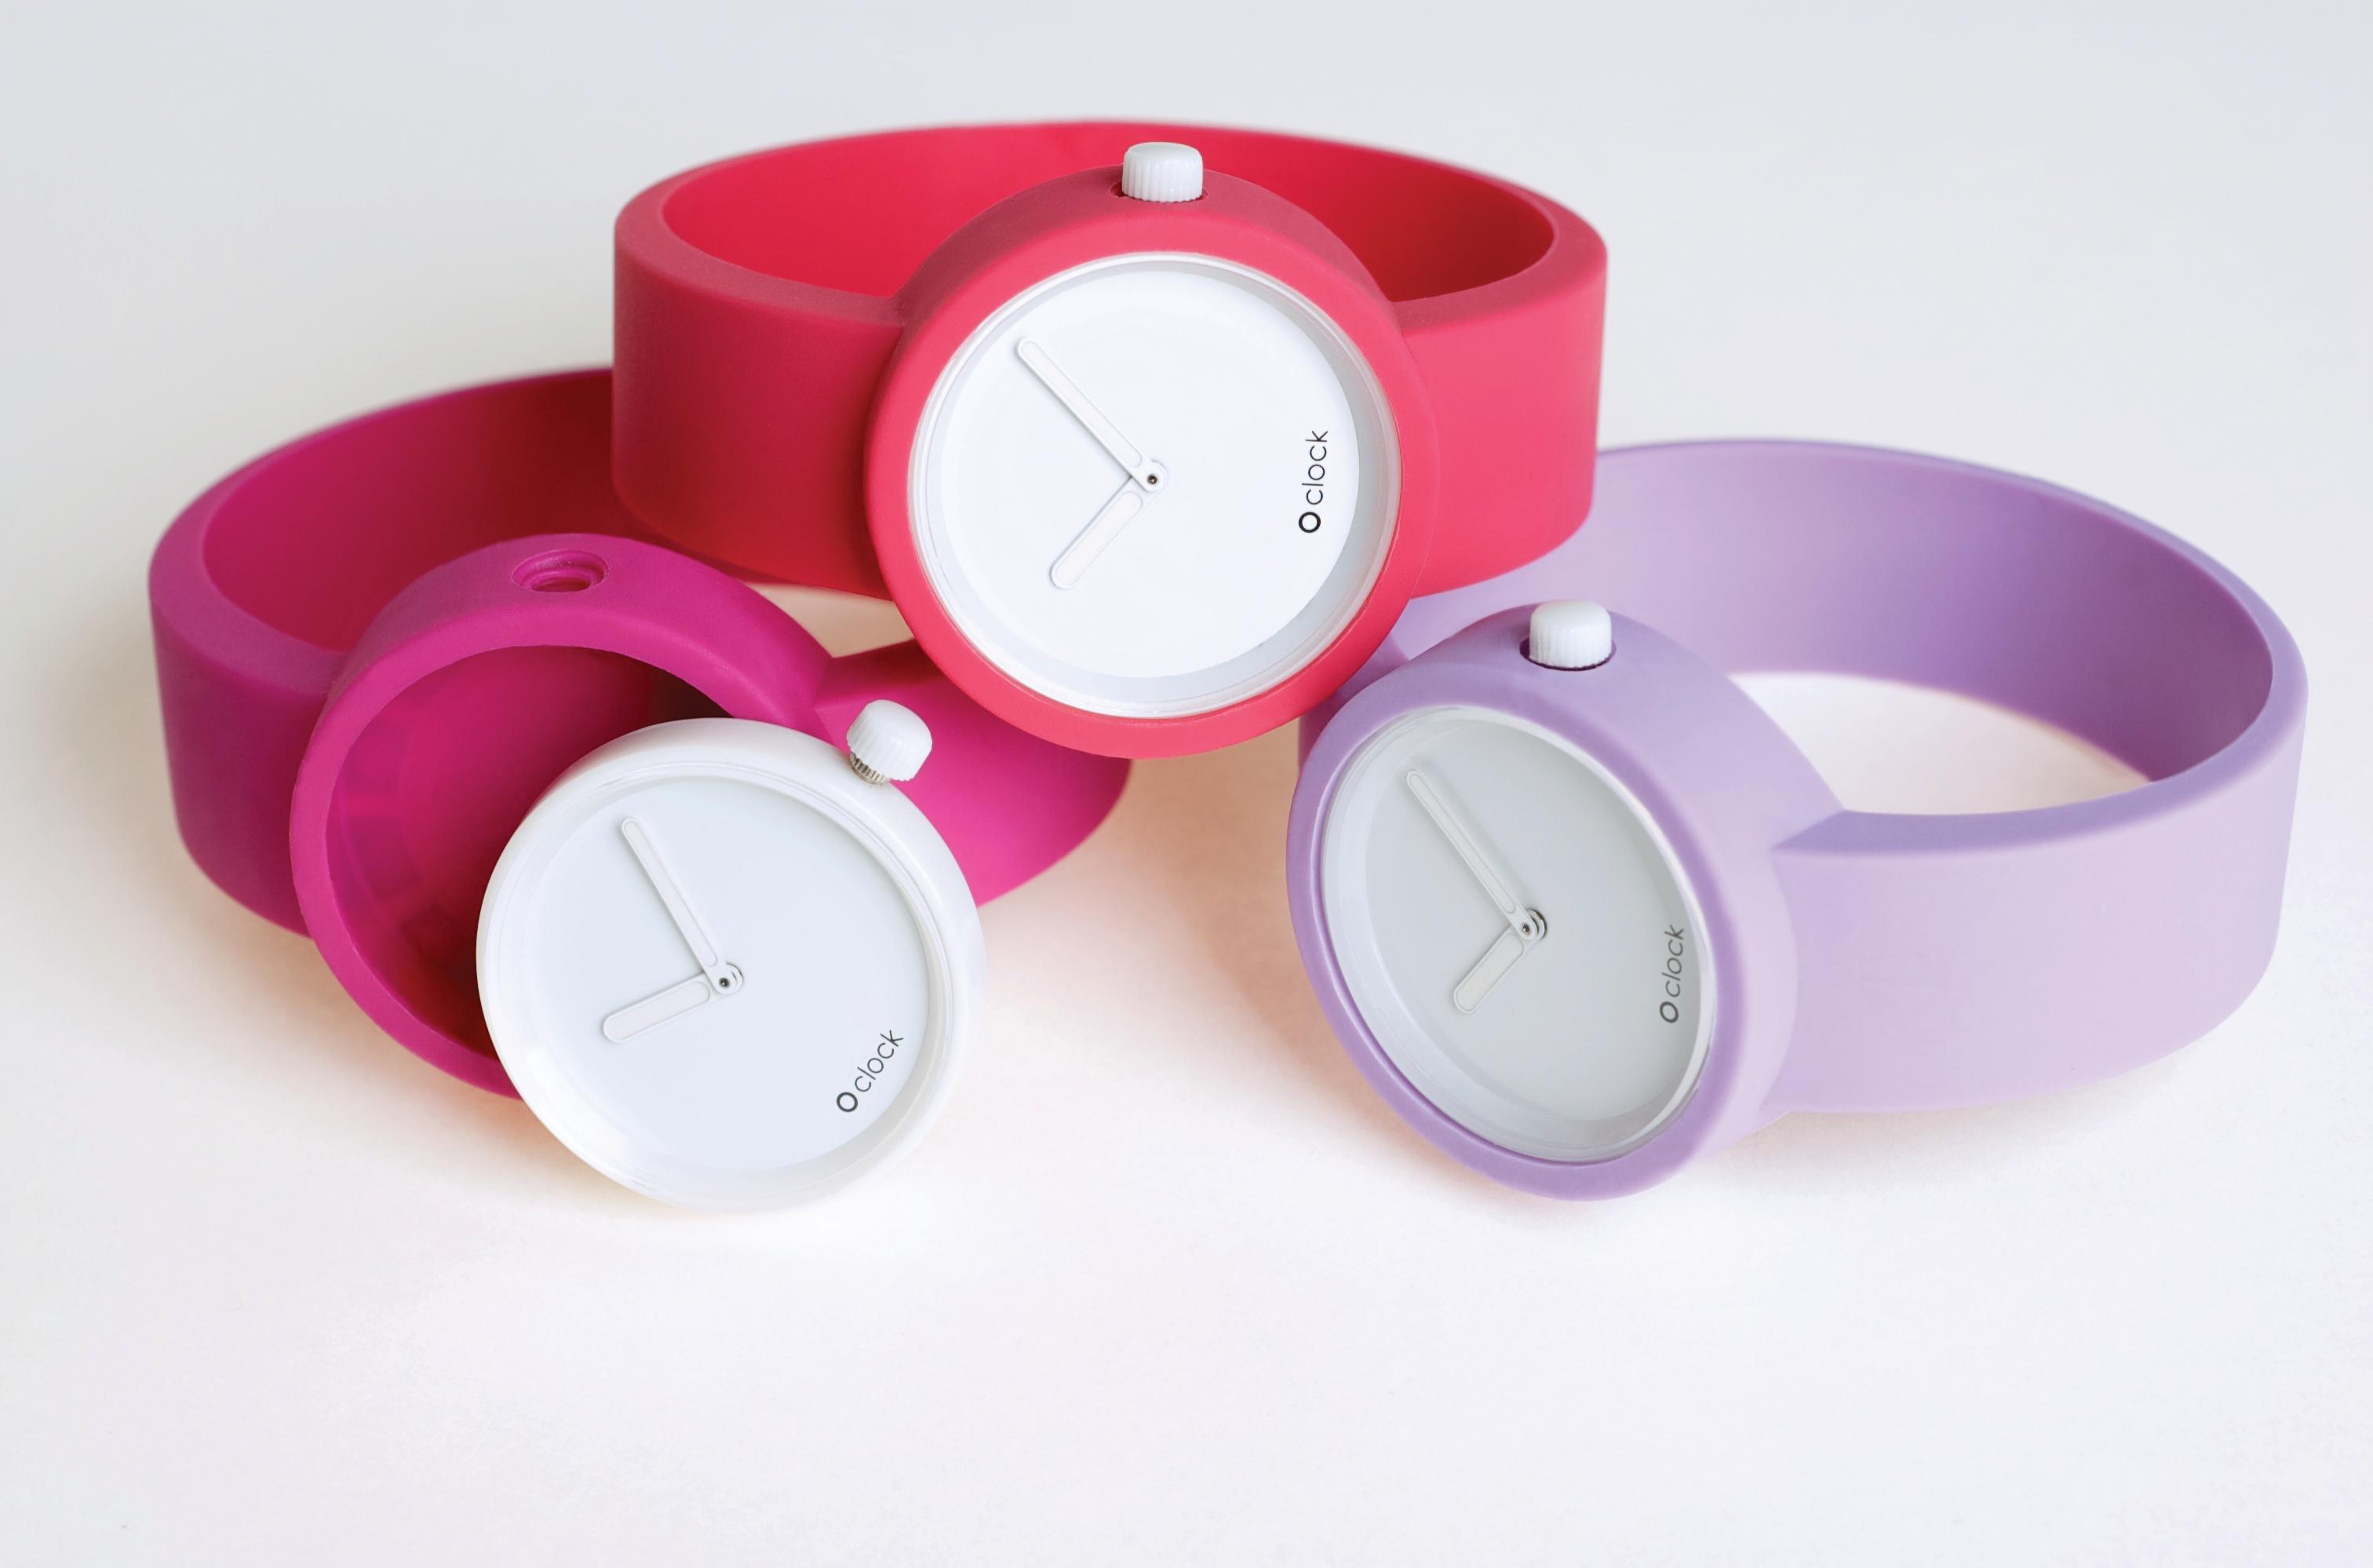 Oclock Watches